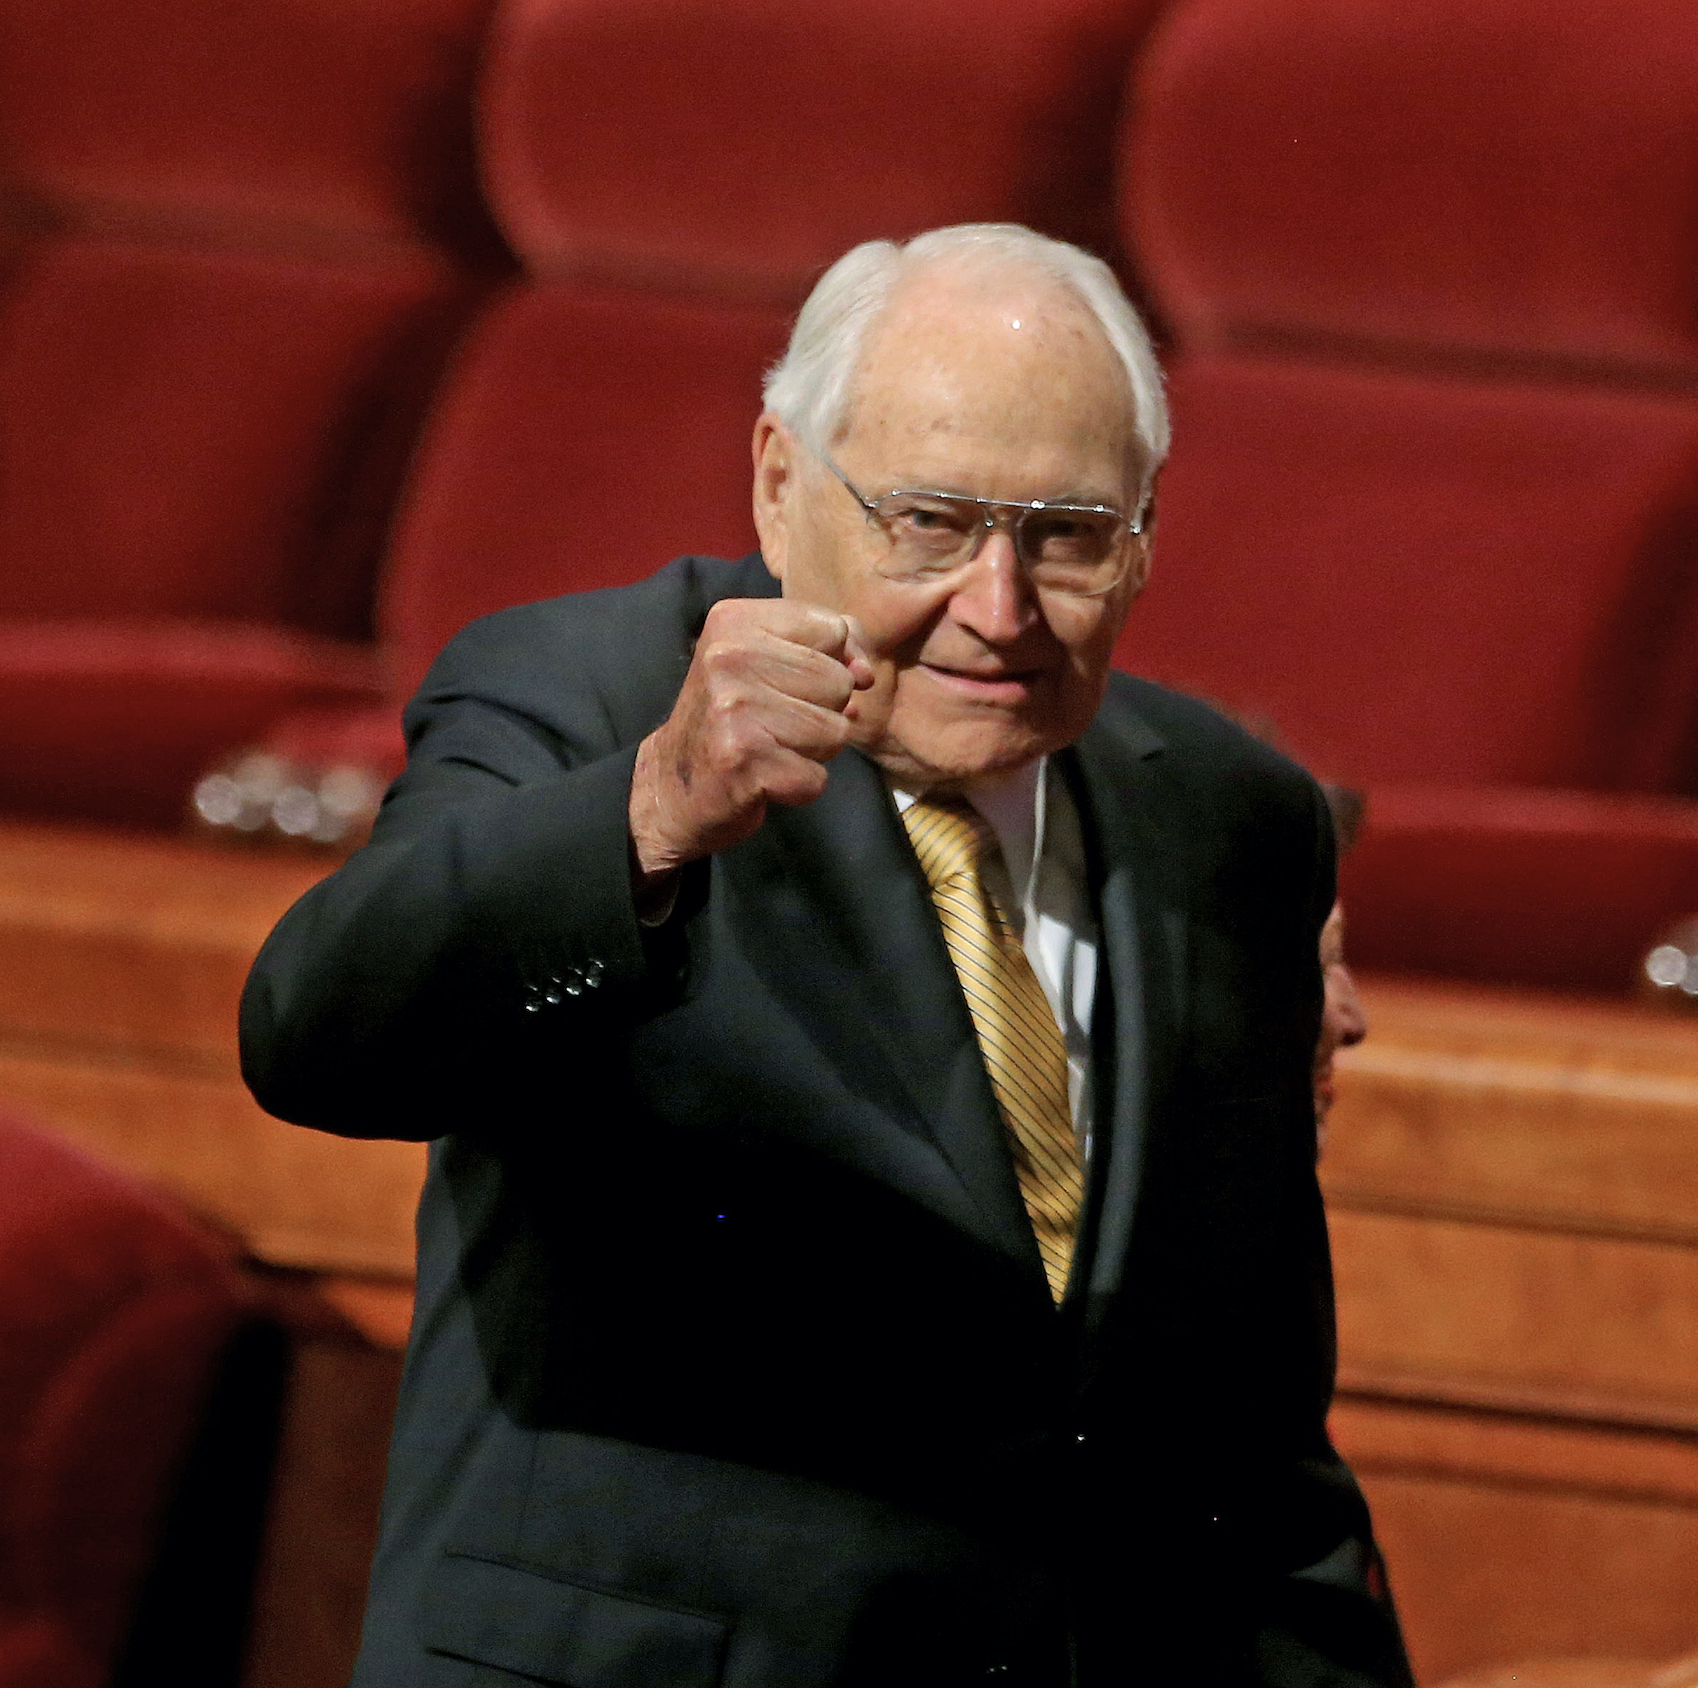 Elder L. Tom Perry of the Quorum of the Twelve Apostles pumps his fist.